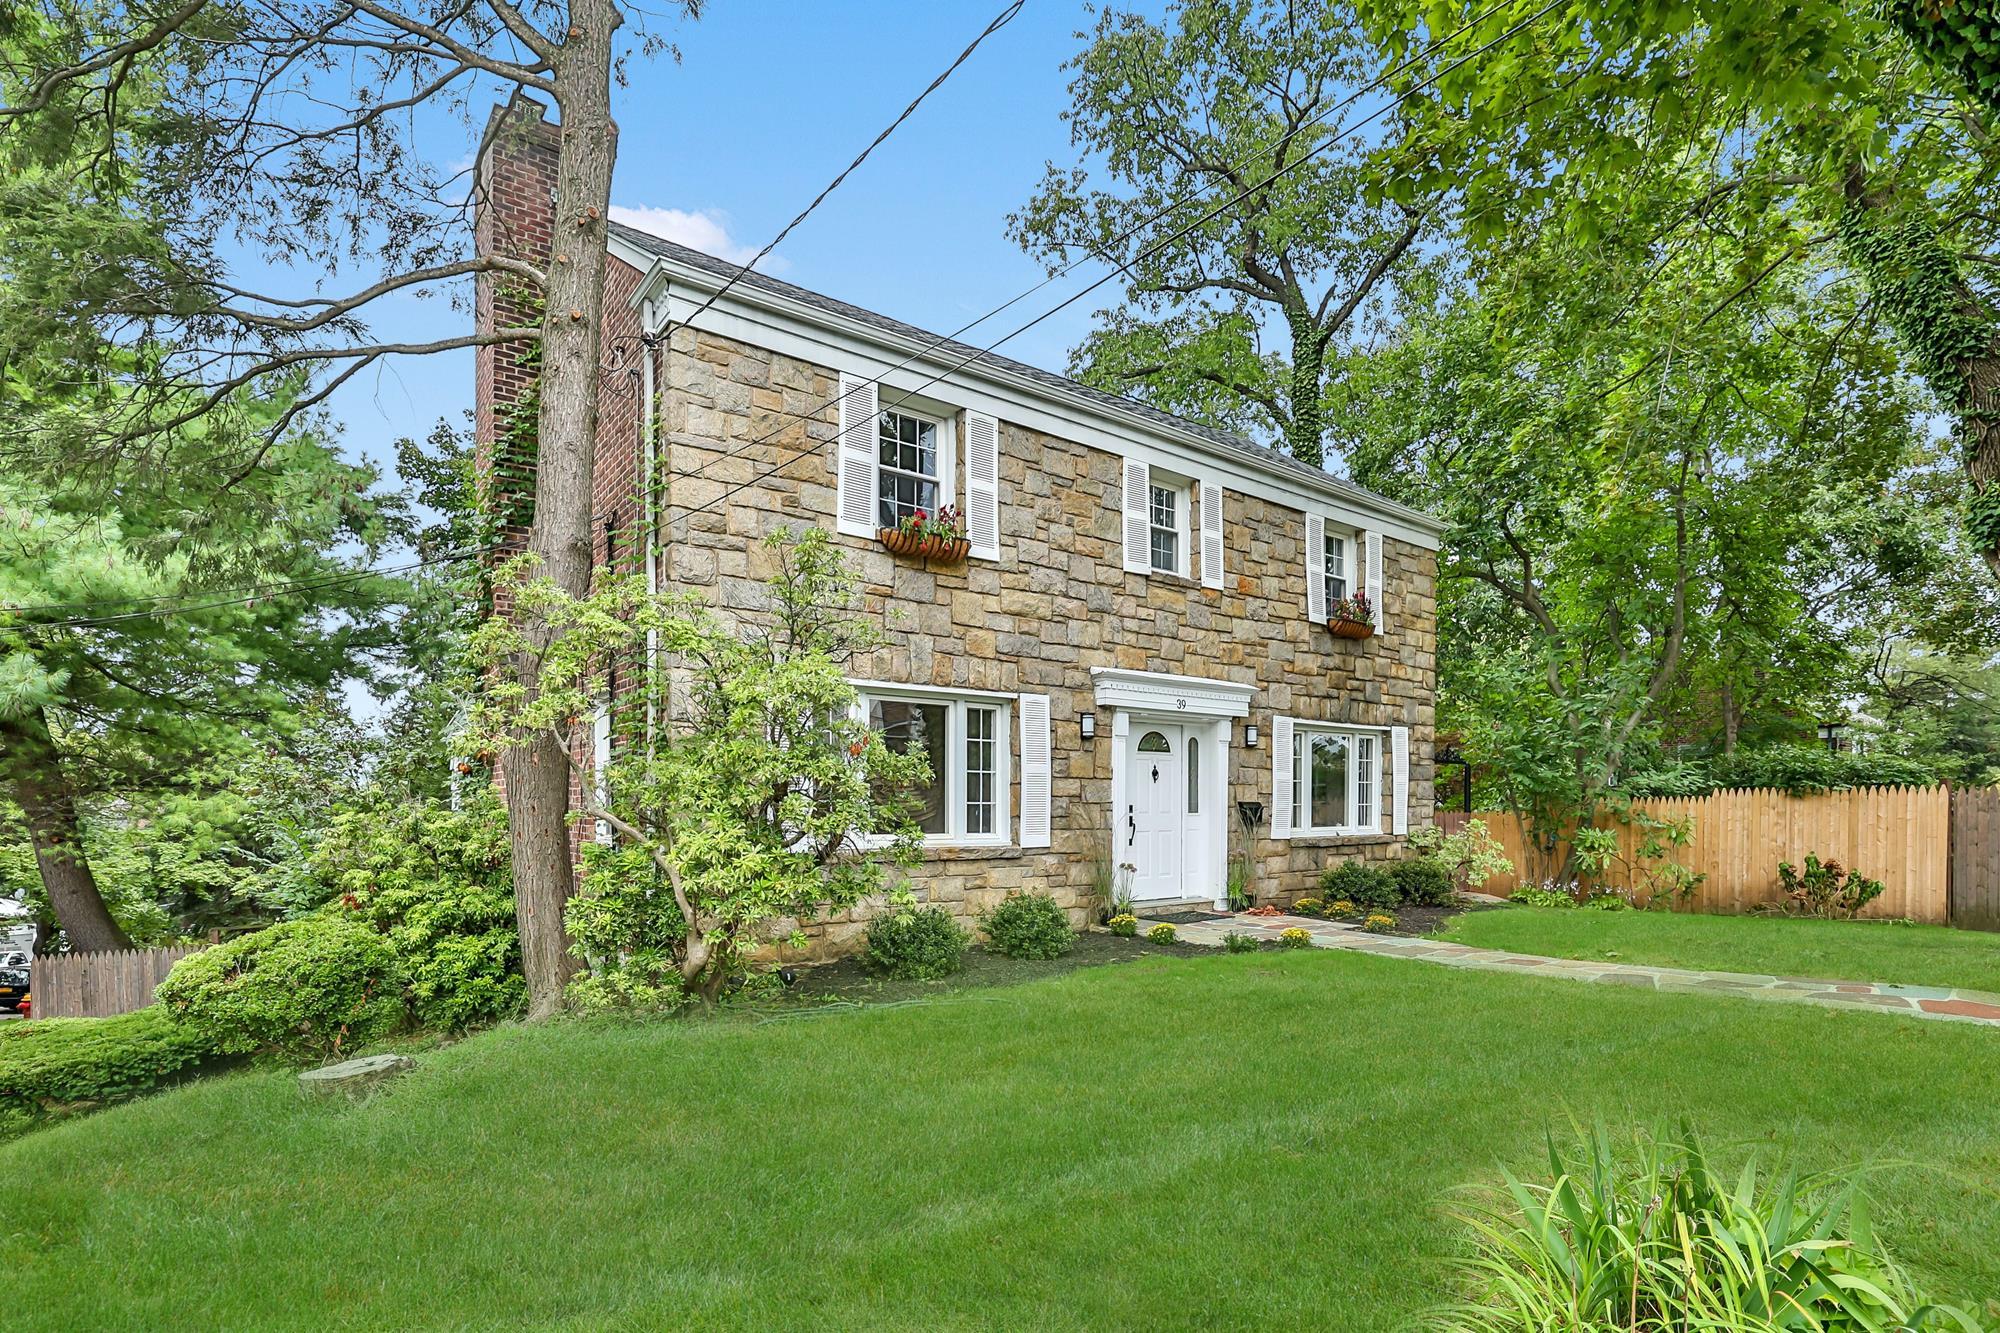 4-Bd. Stone & Brick Colonial w/ Lawns & Patio